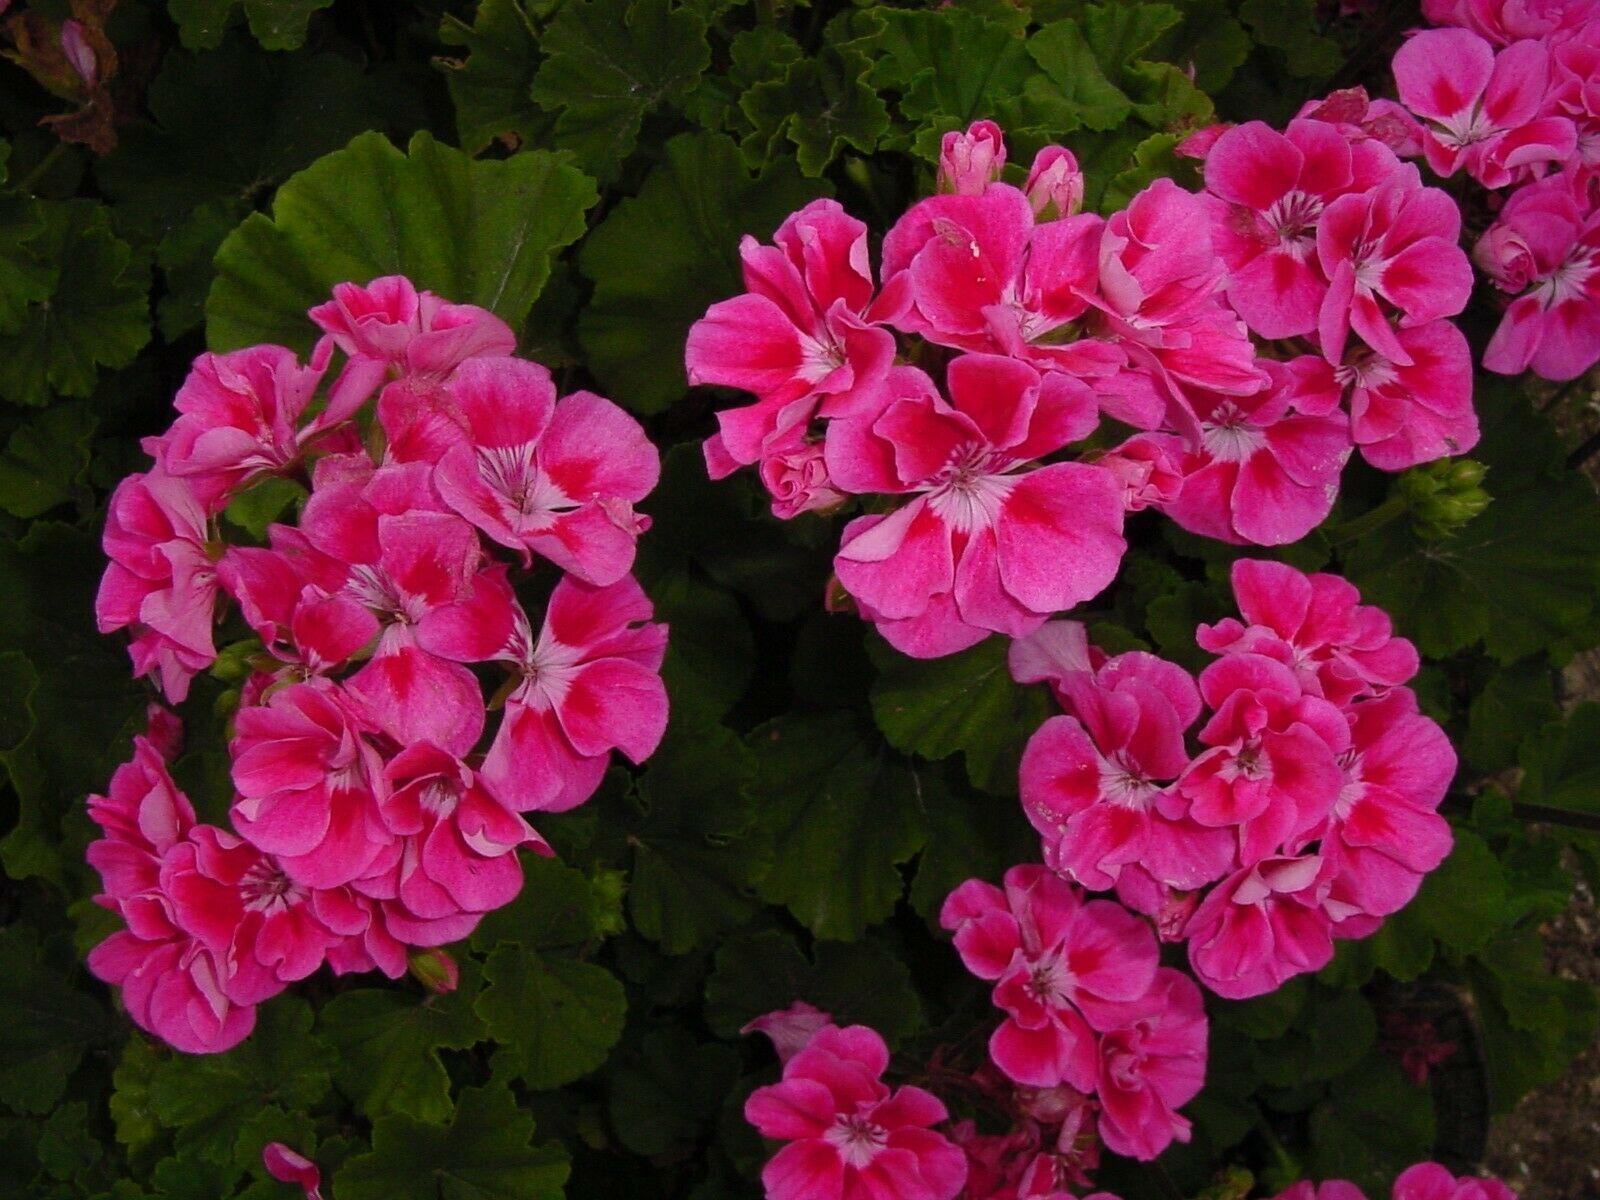 50 Bright Pink Geranium Seeds Hanging Basket Perennial Flowers - TTS - $29.95